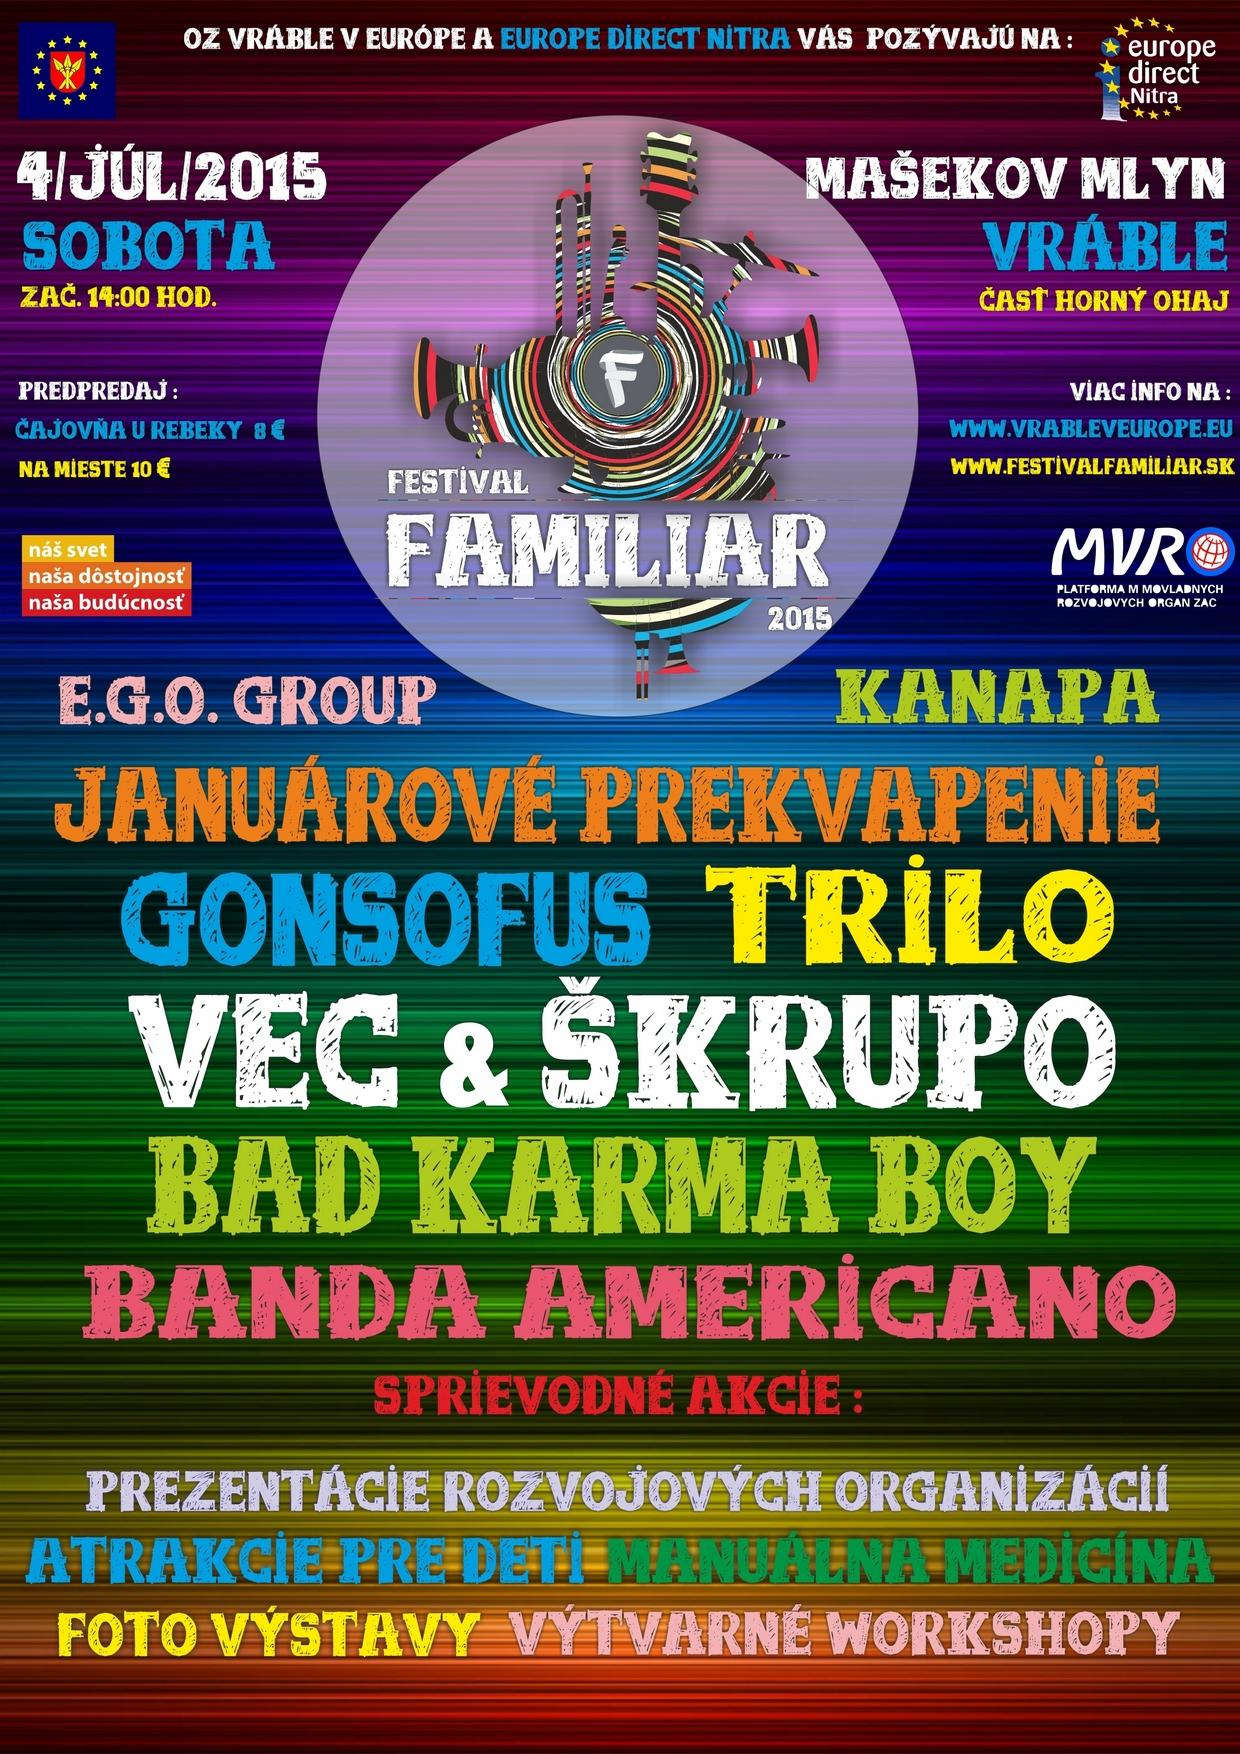 festival Familiar 2015